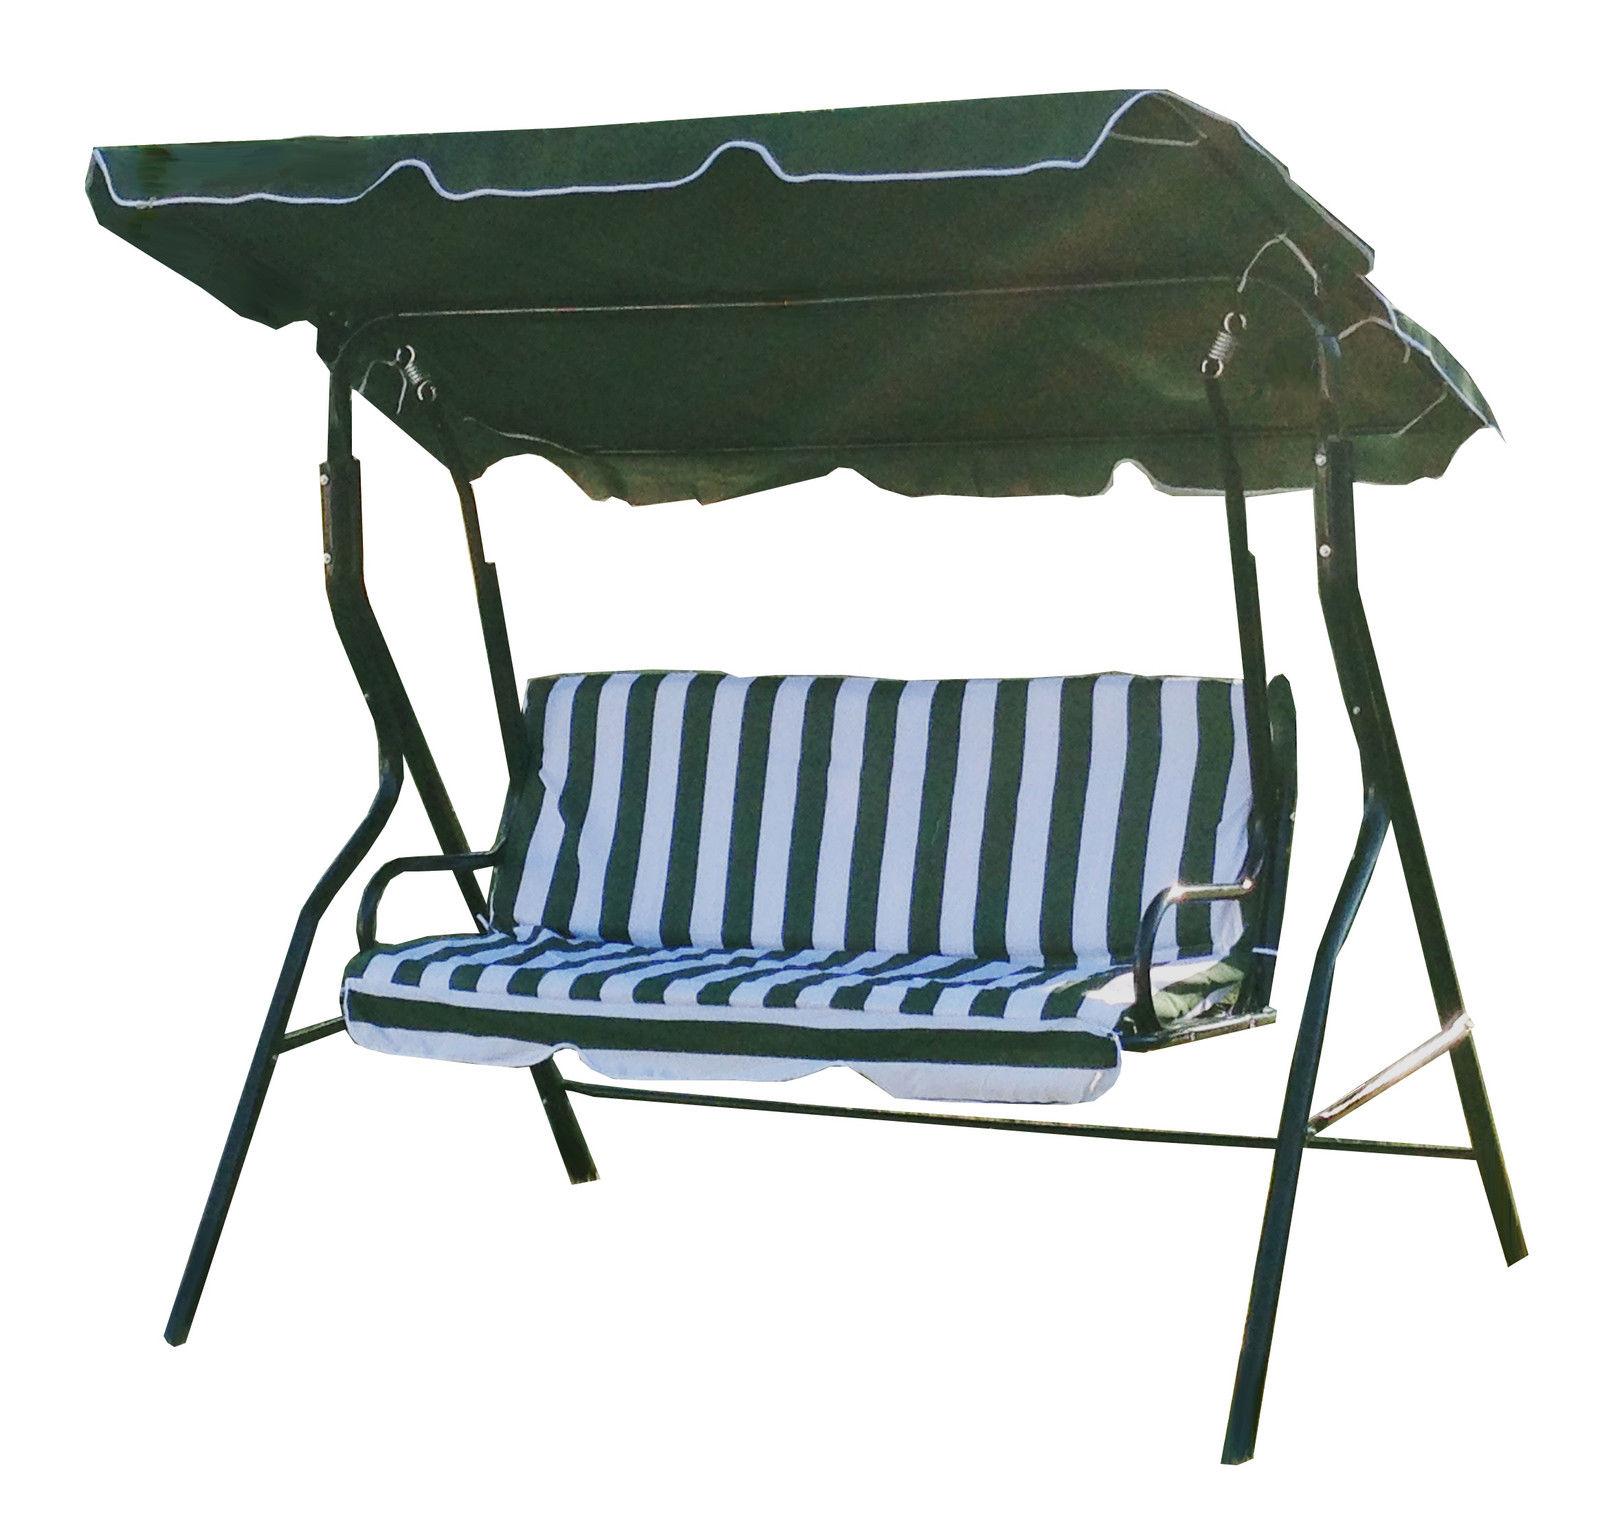 white swing chair uk feet pads swinging garden hammock outdoor bench seat